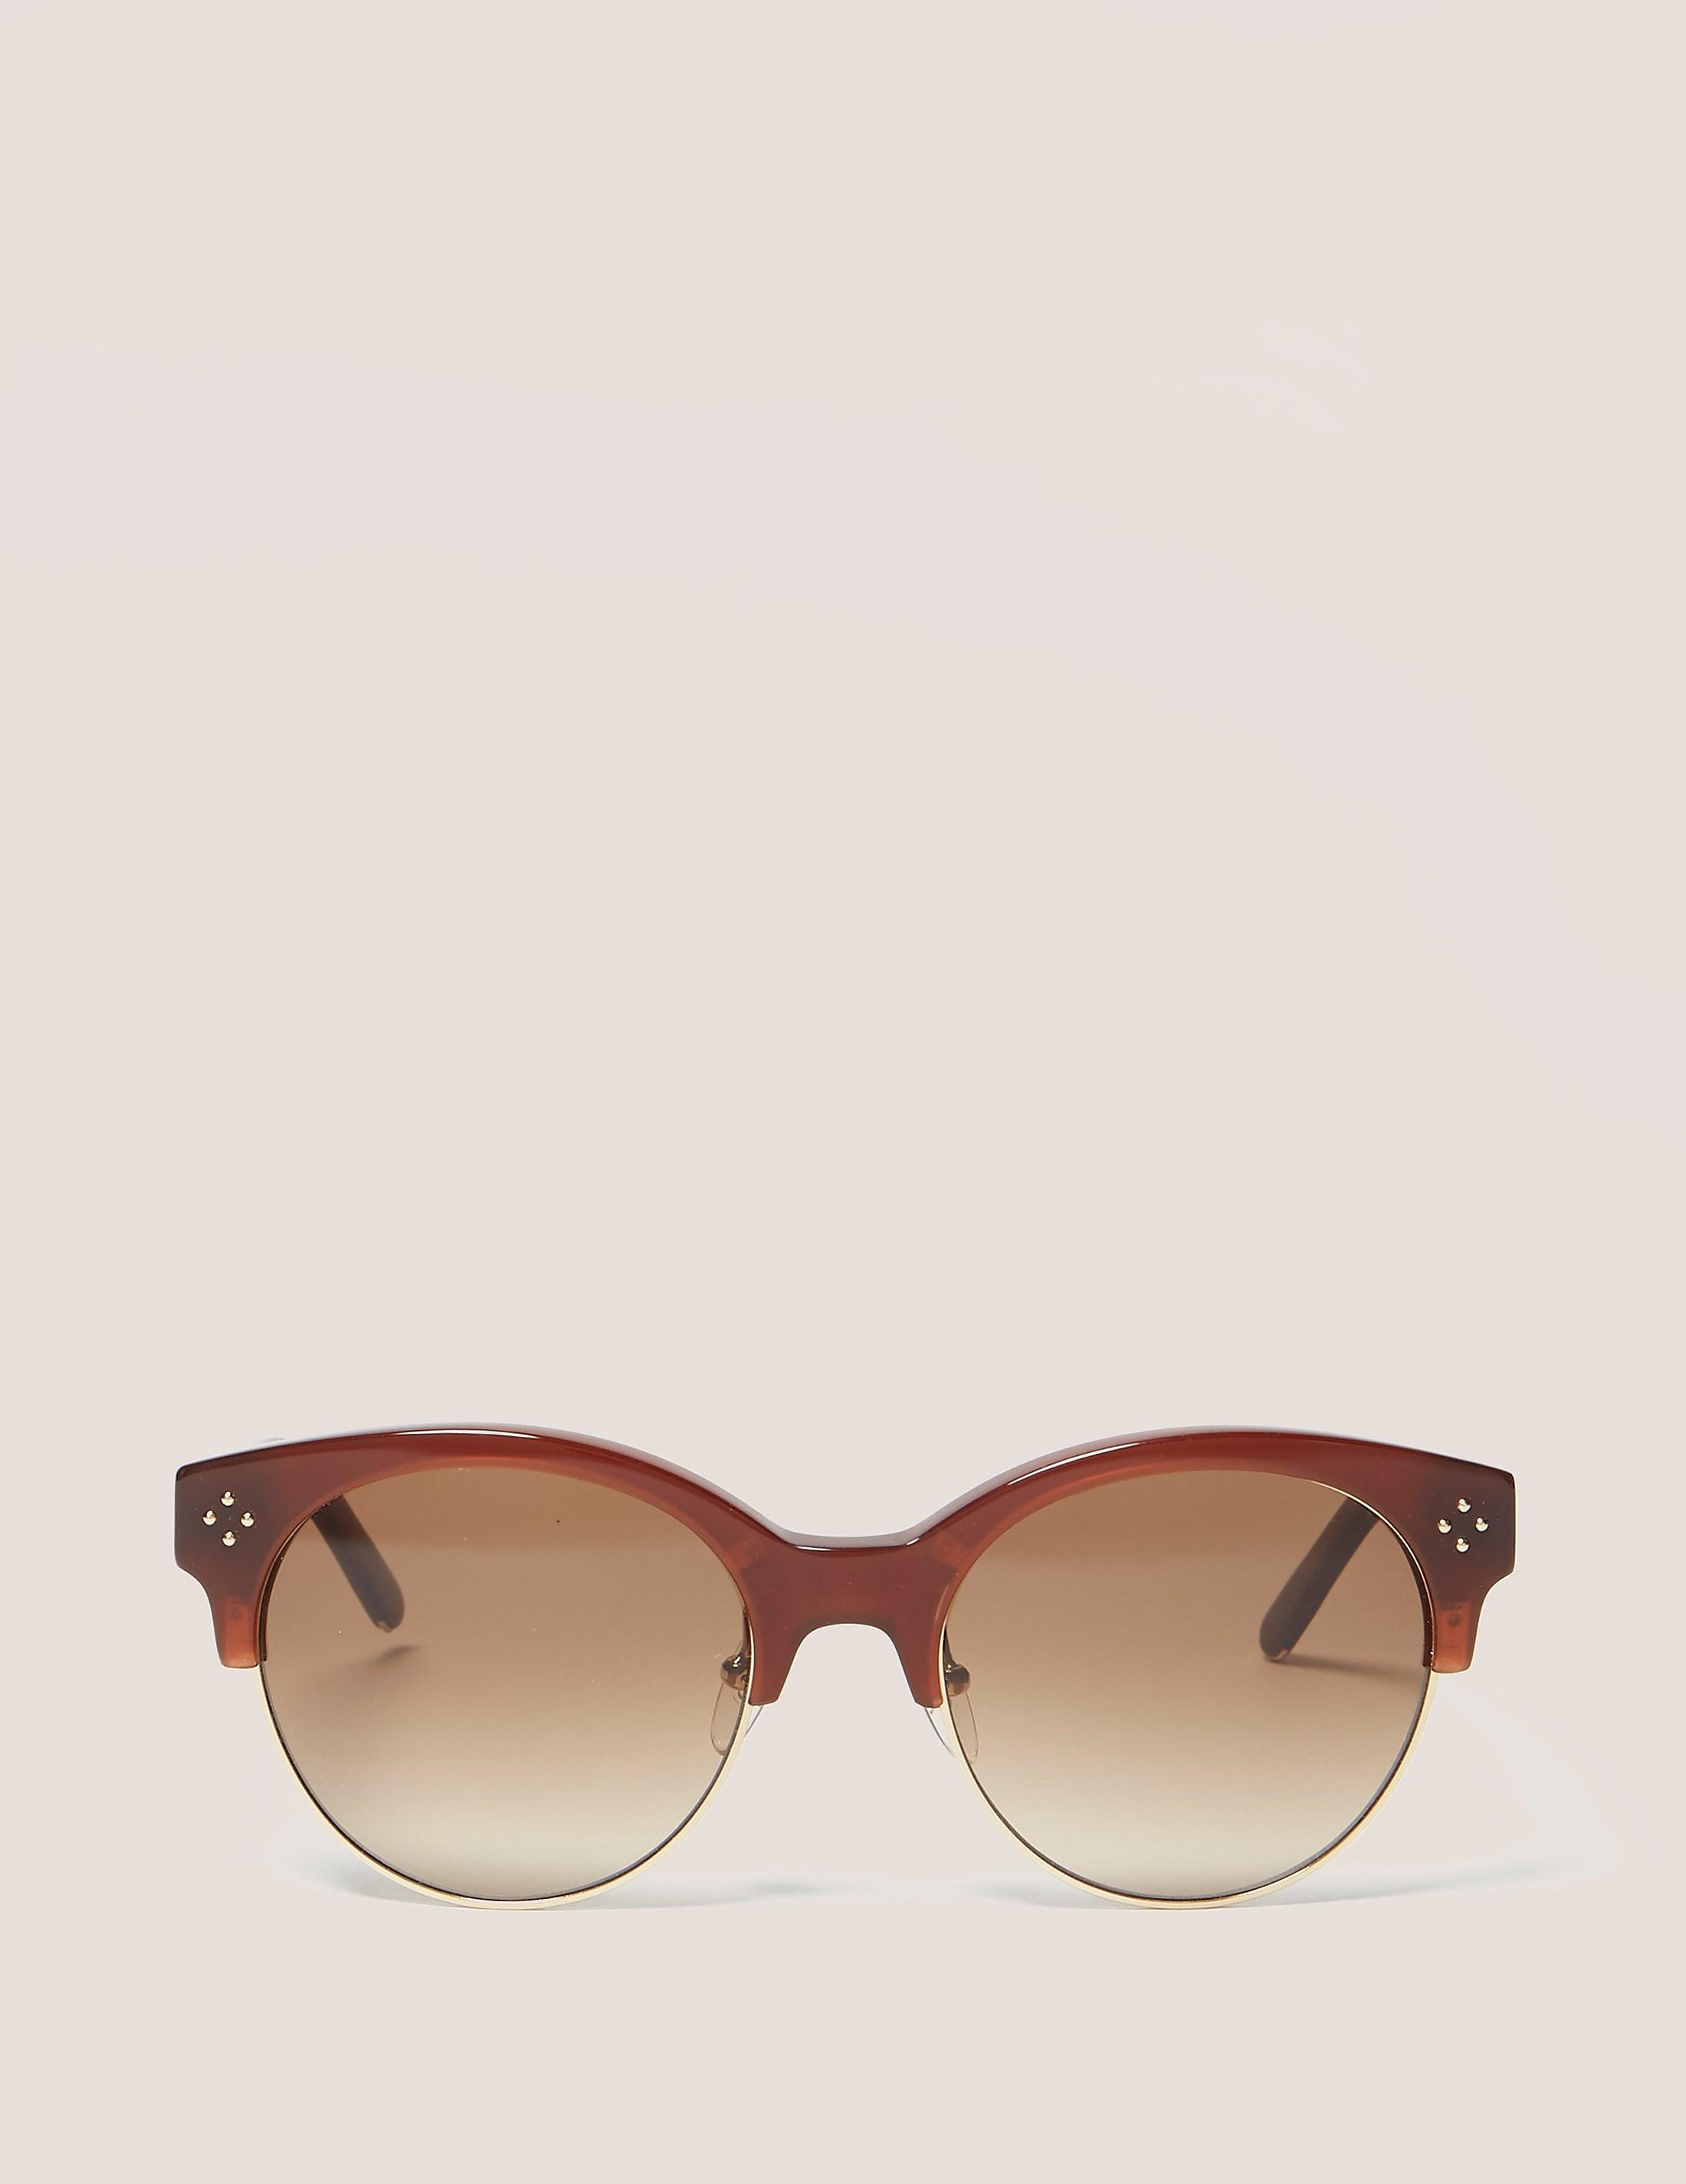 Chloe Boxwood Sunglasses